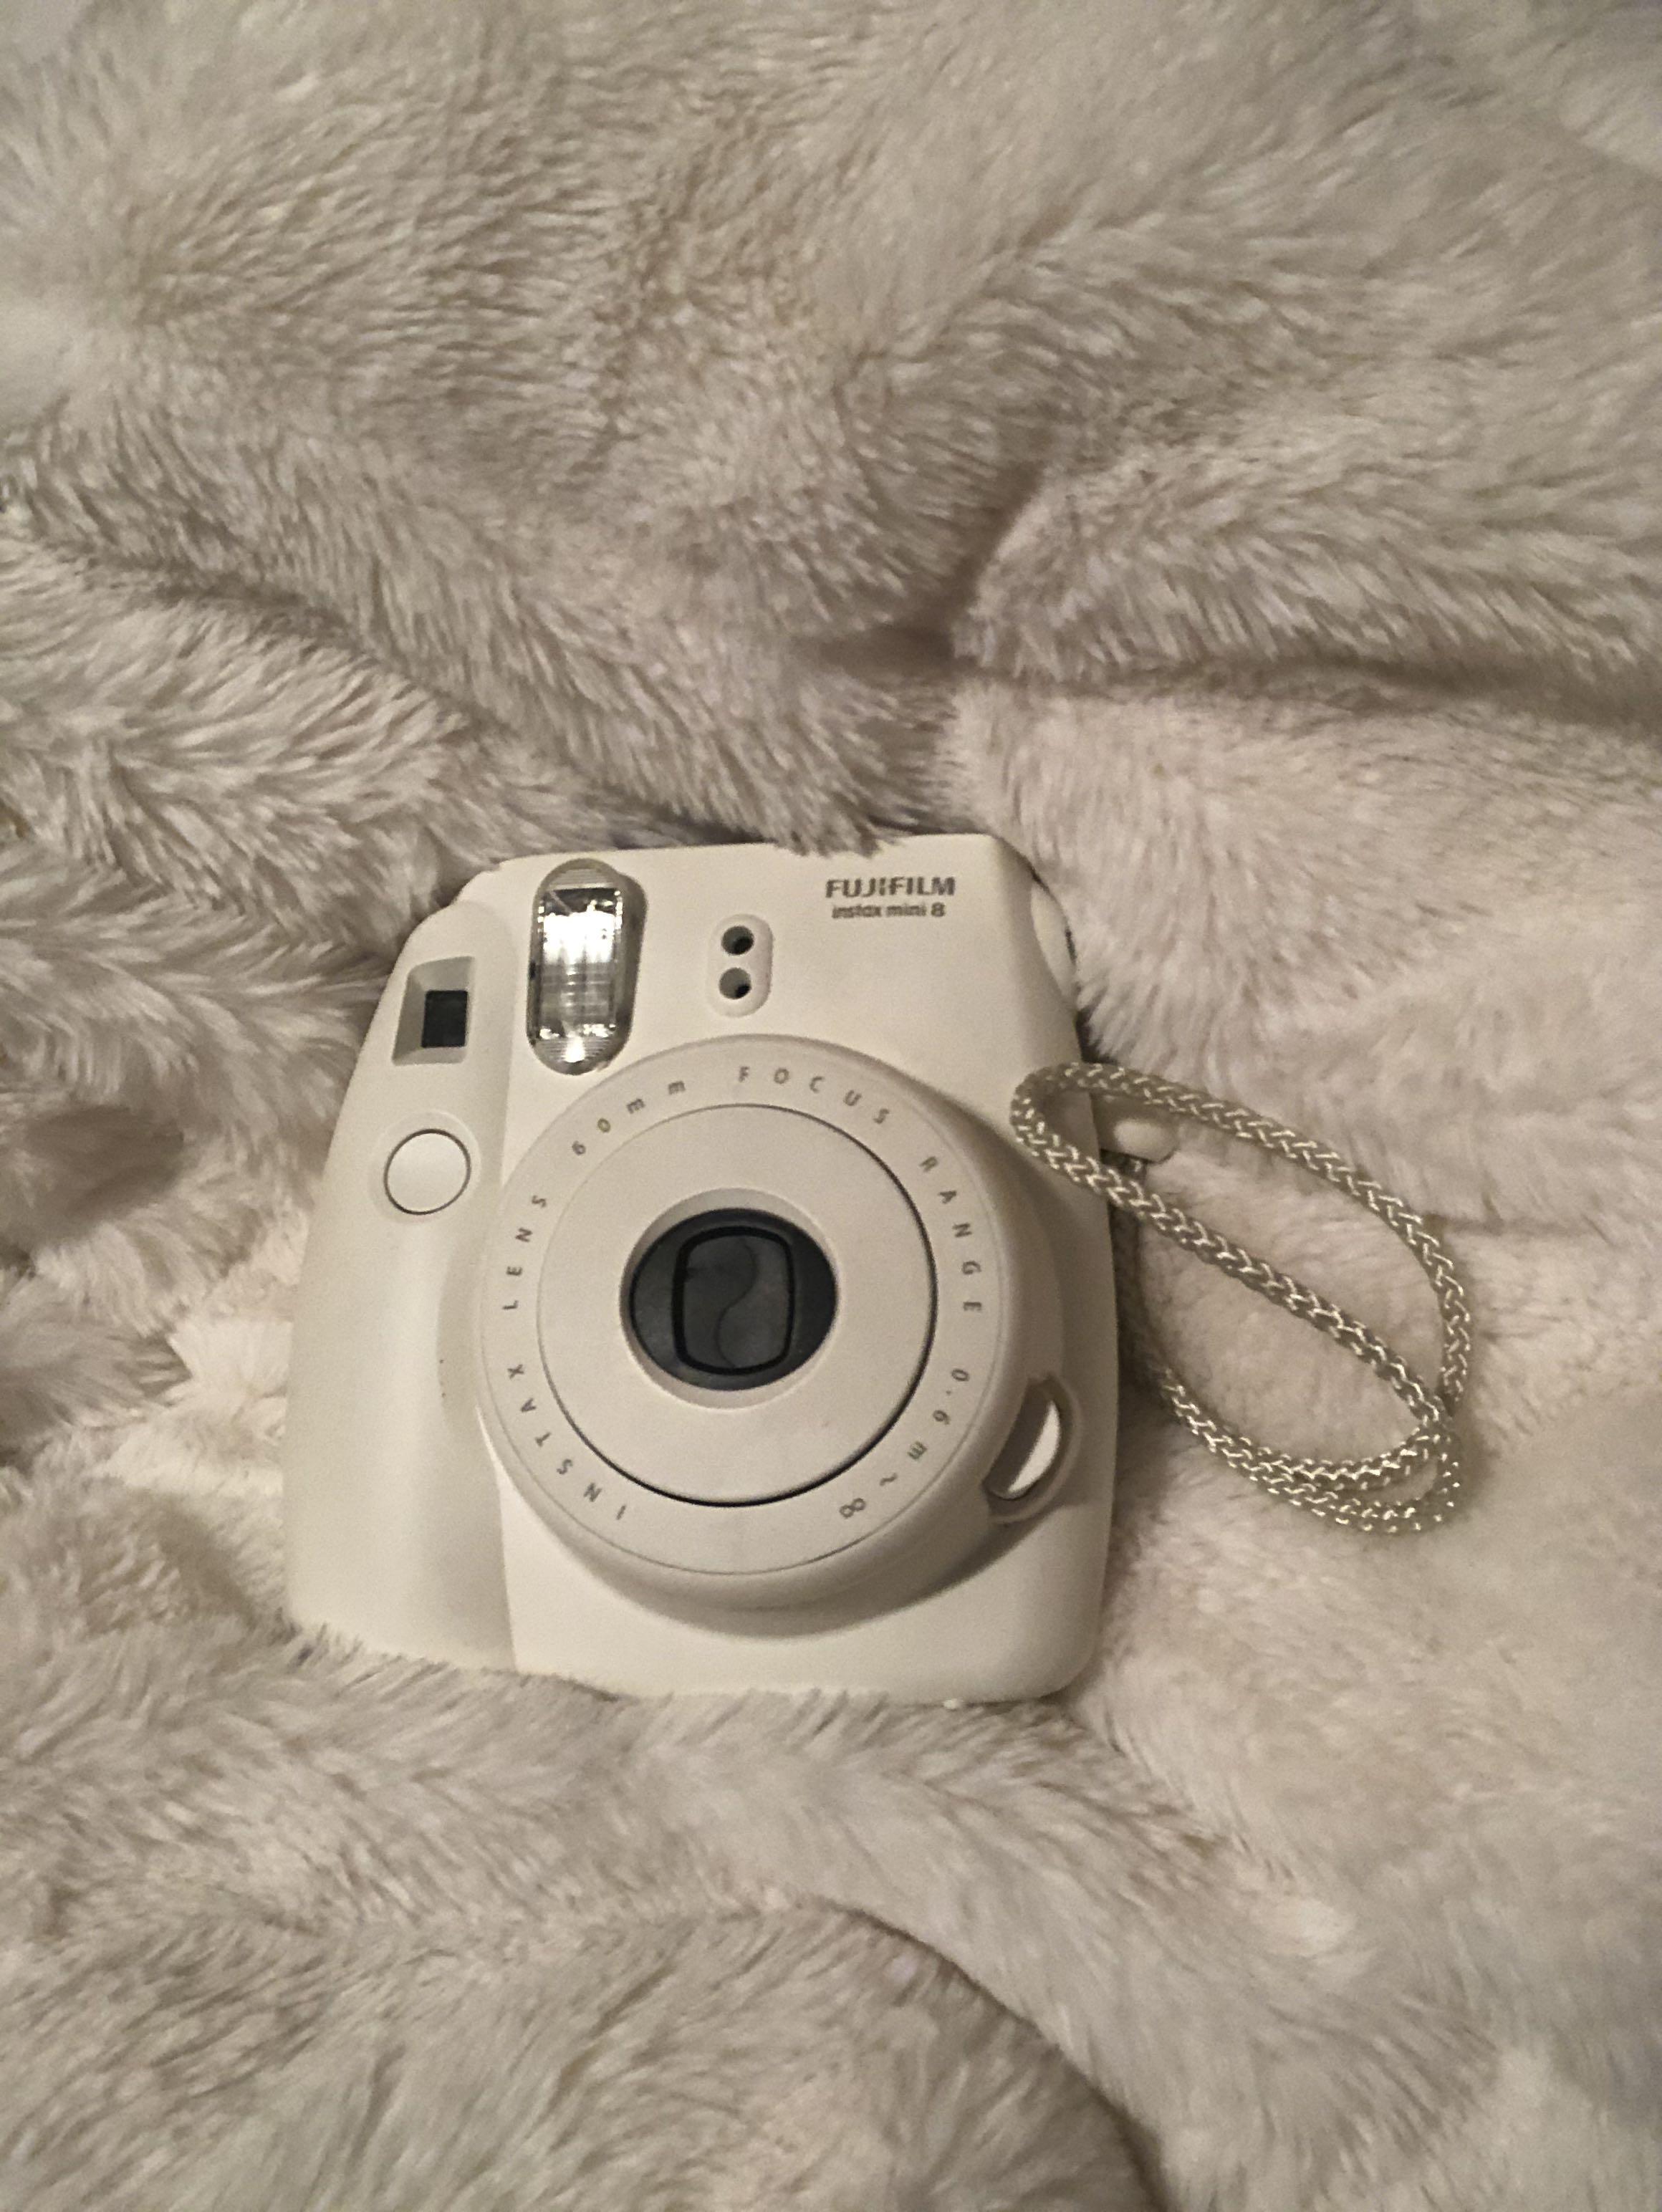 FUJIFILM Instax Mini 8 - Polaroid Camera